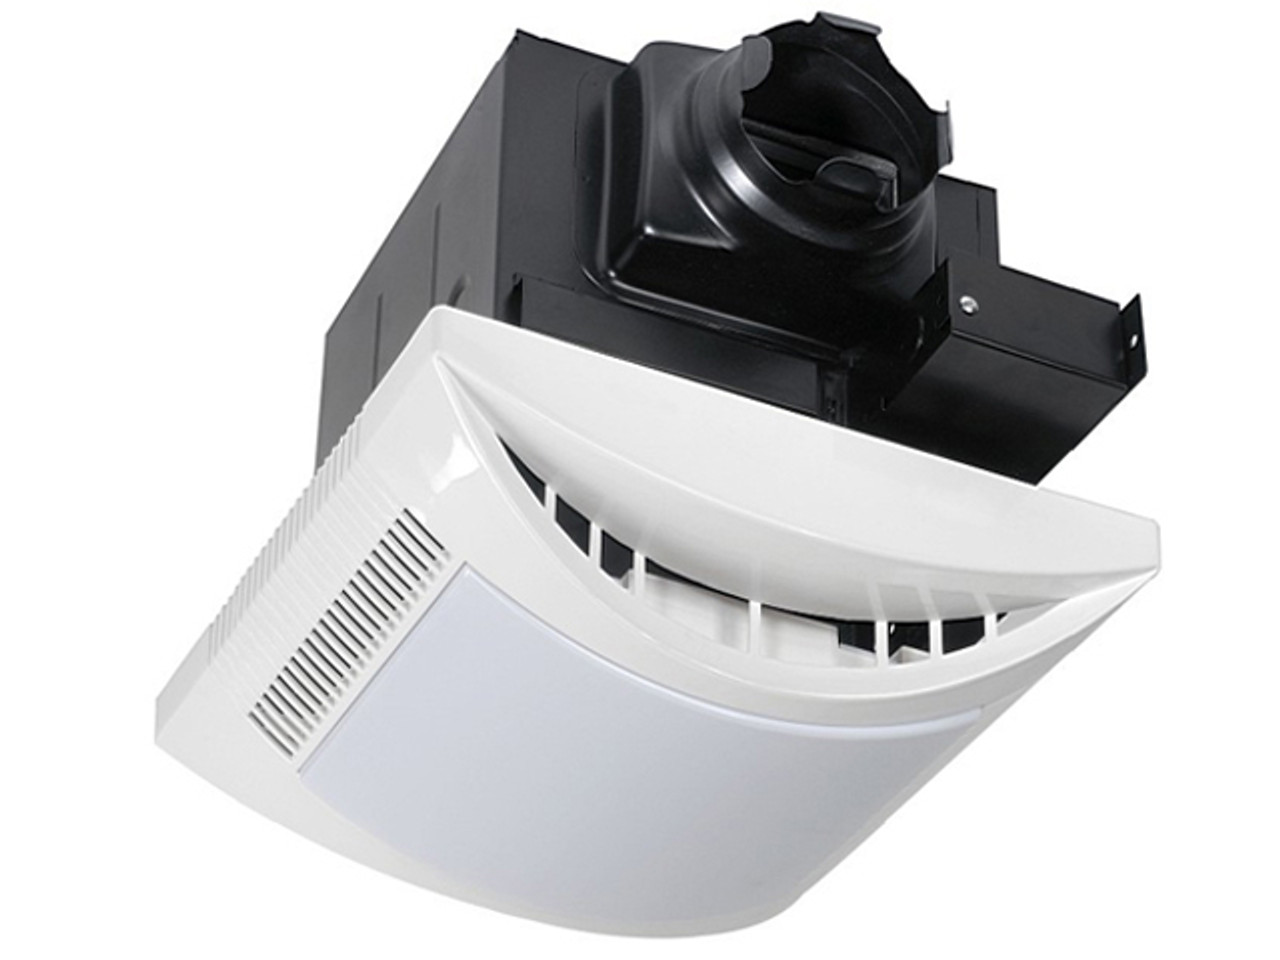 kv110la bathroom exhaust fan with lights kstar